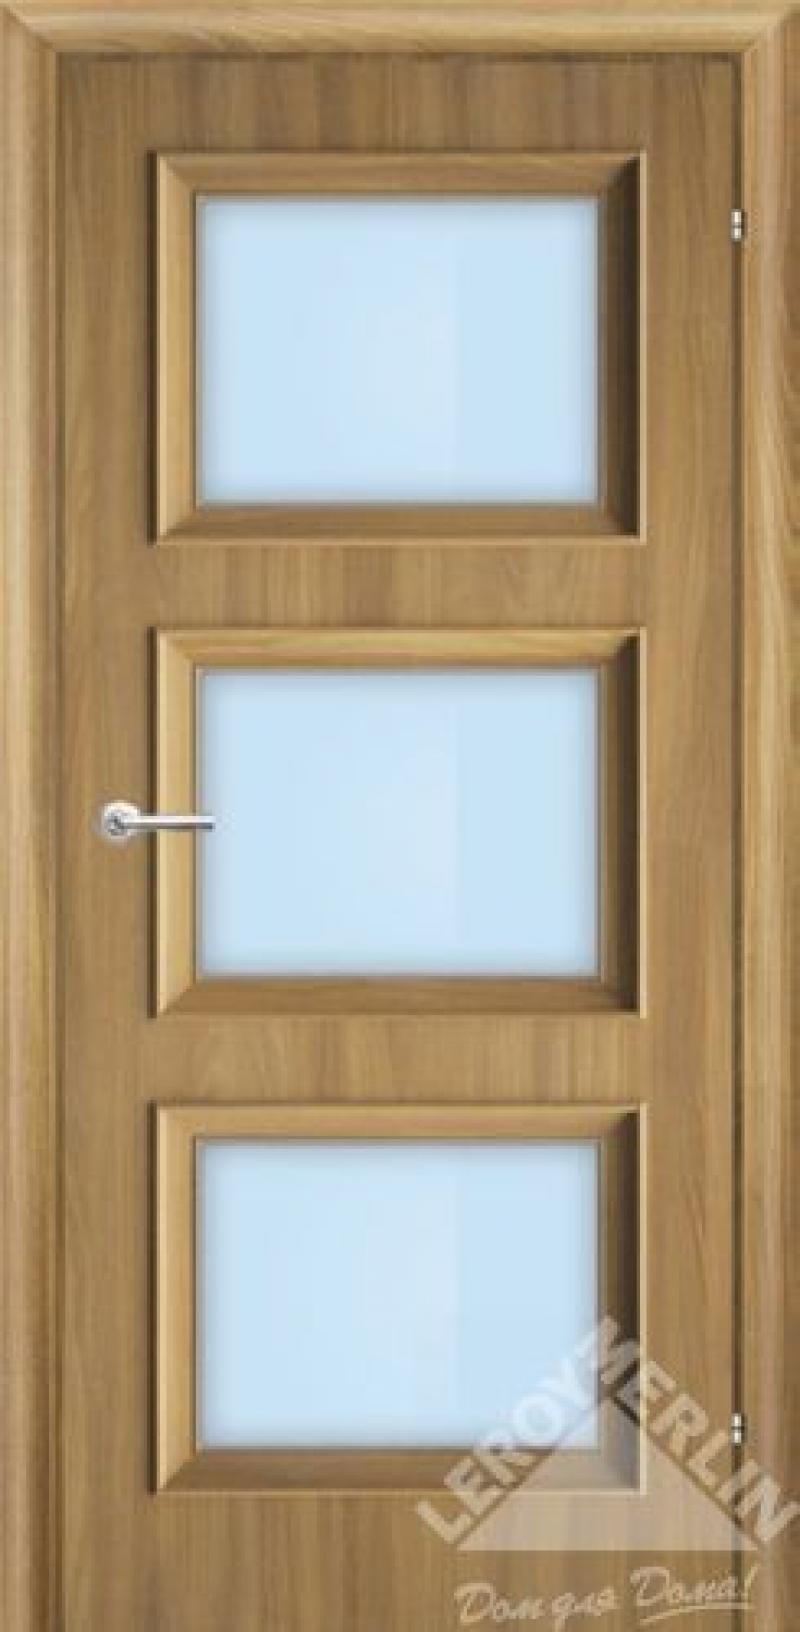 Дверь межкомнатная остеклённая, 700 мм, акация, замок 2014